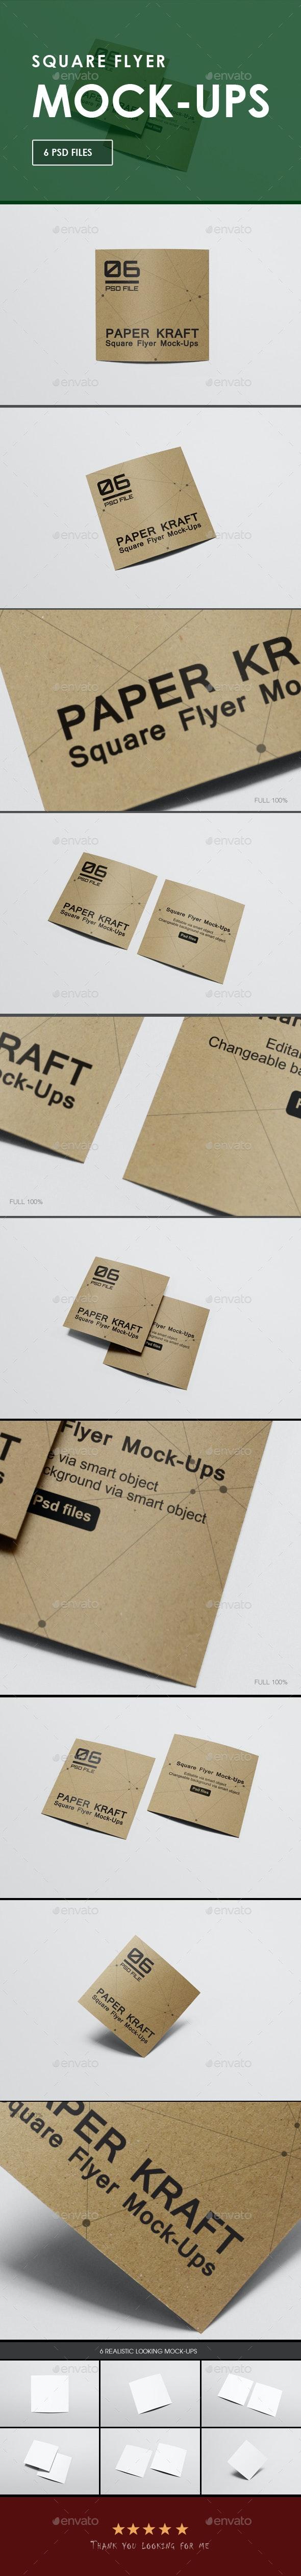 Square Flyer Mock-Ups - Flyers Print